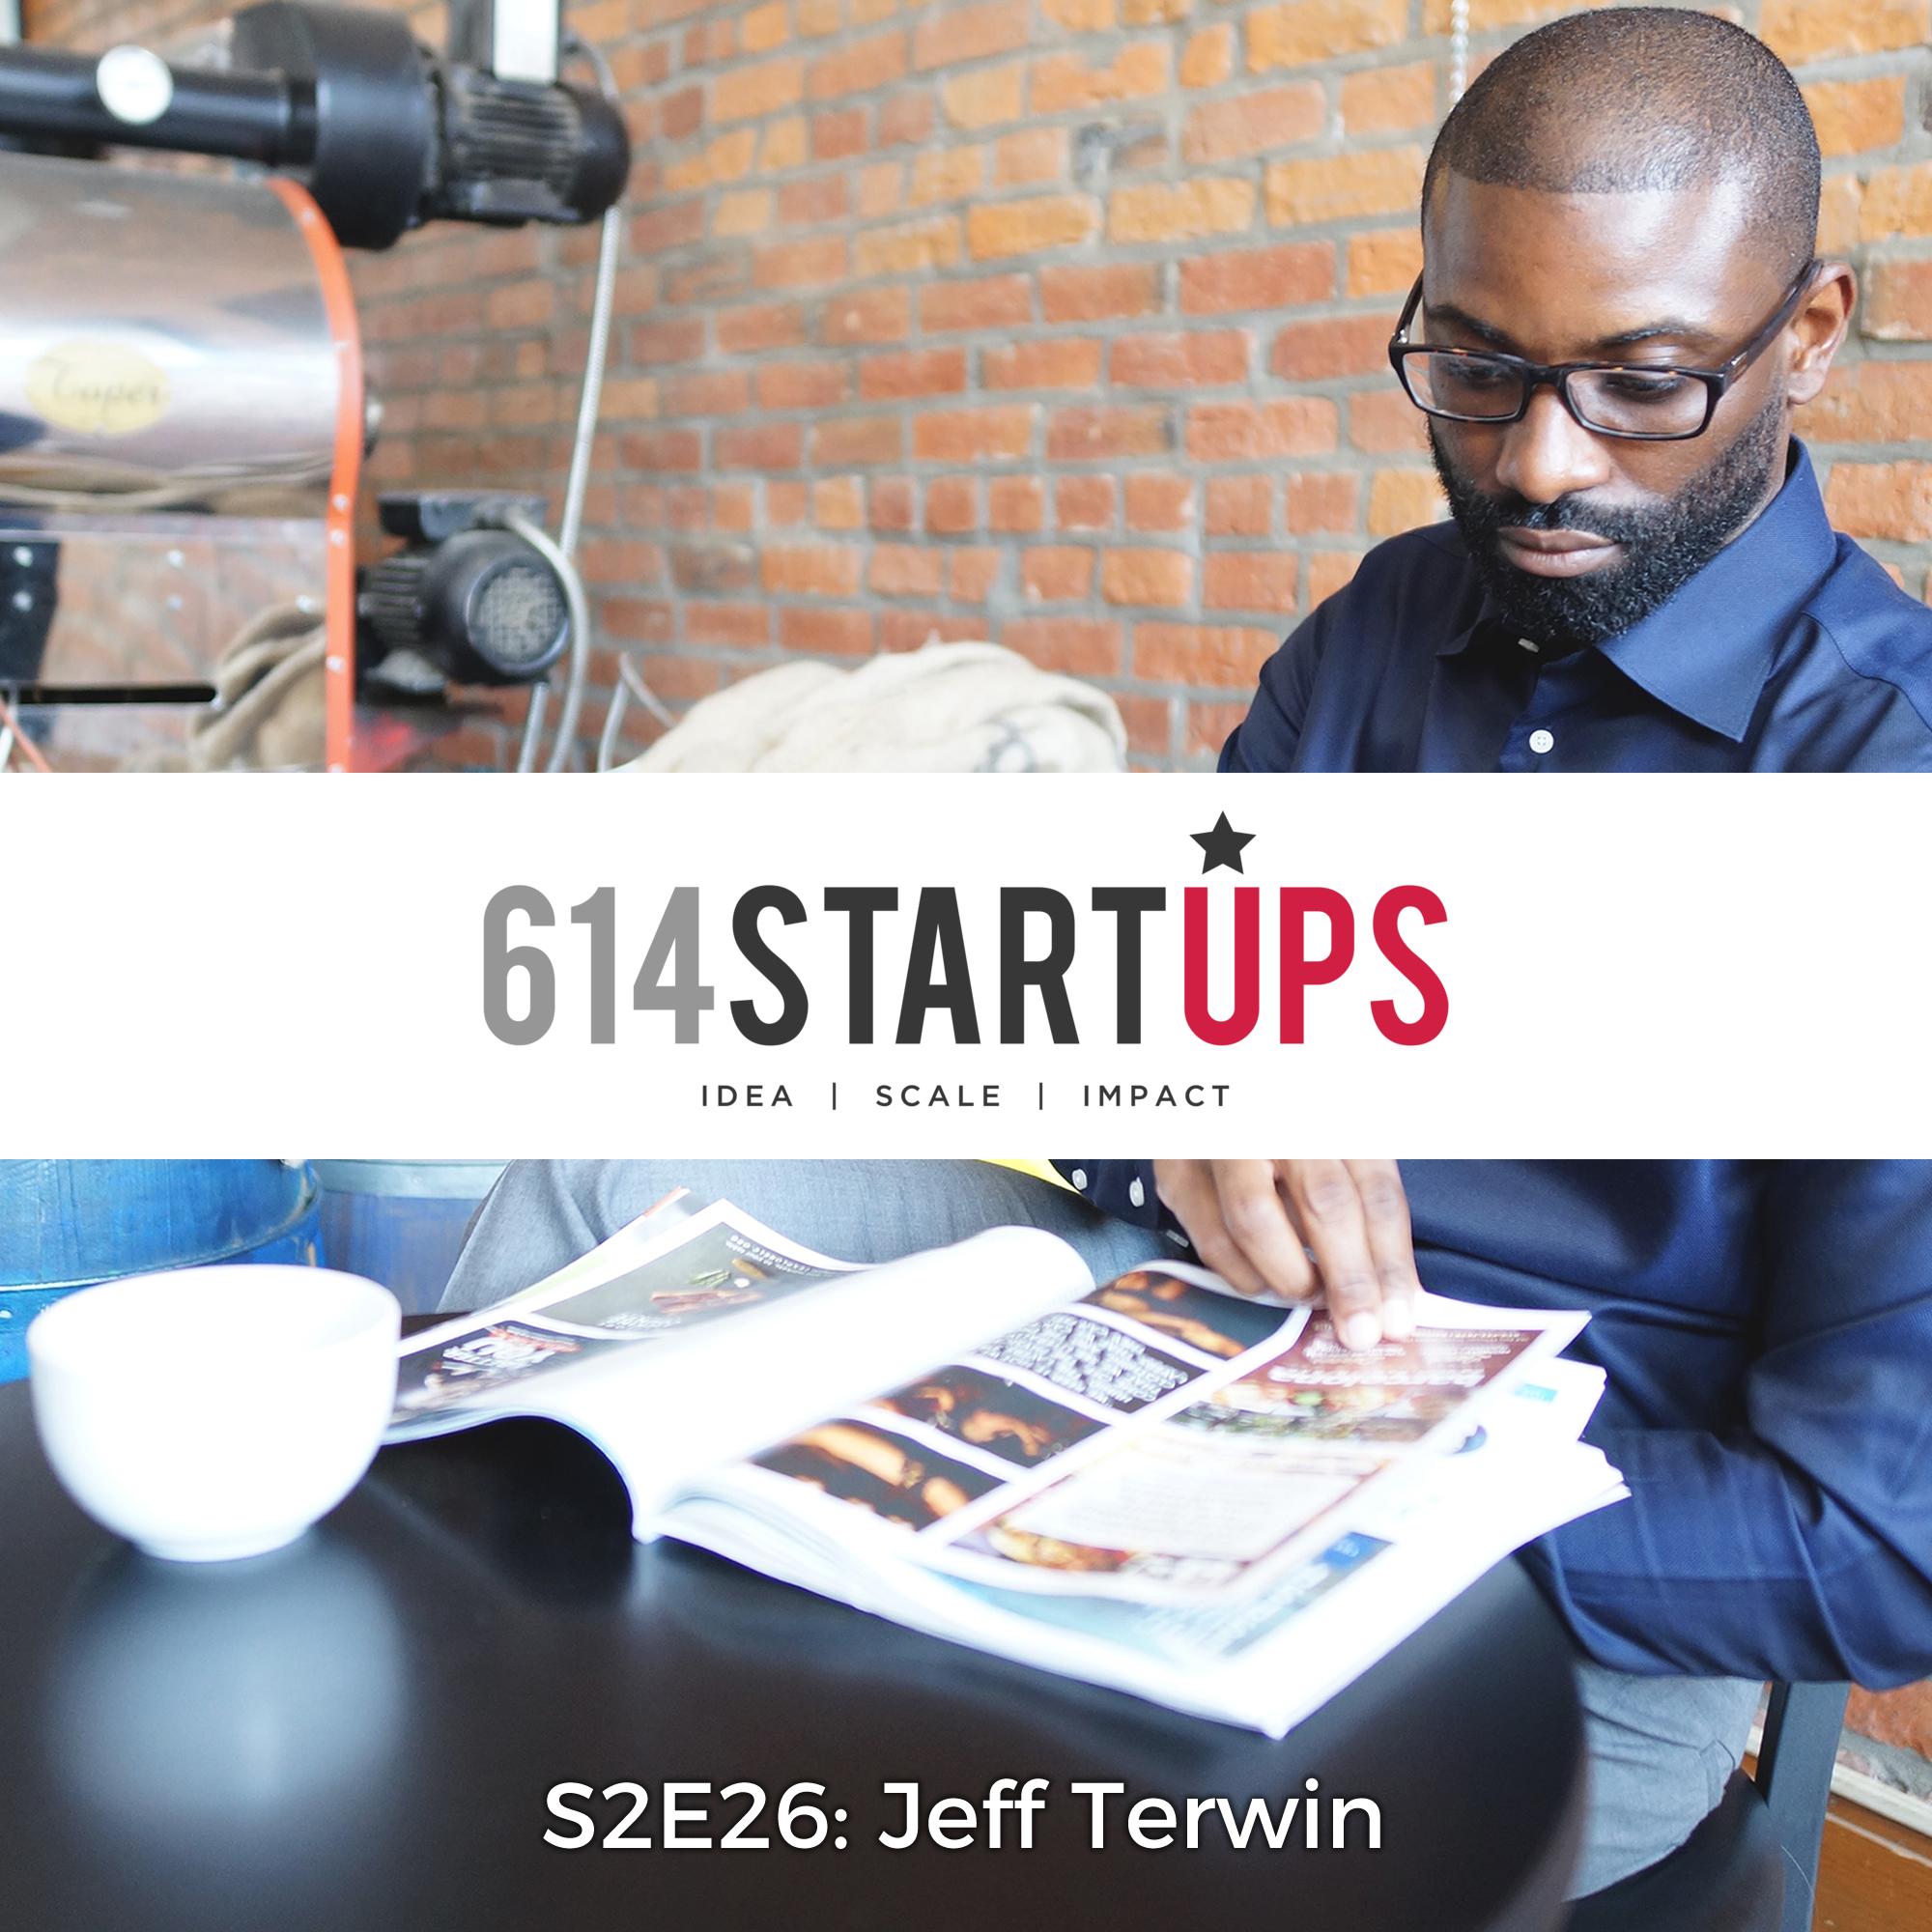 614SU - S2E26 - Jeff Turwin (1).jpg